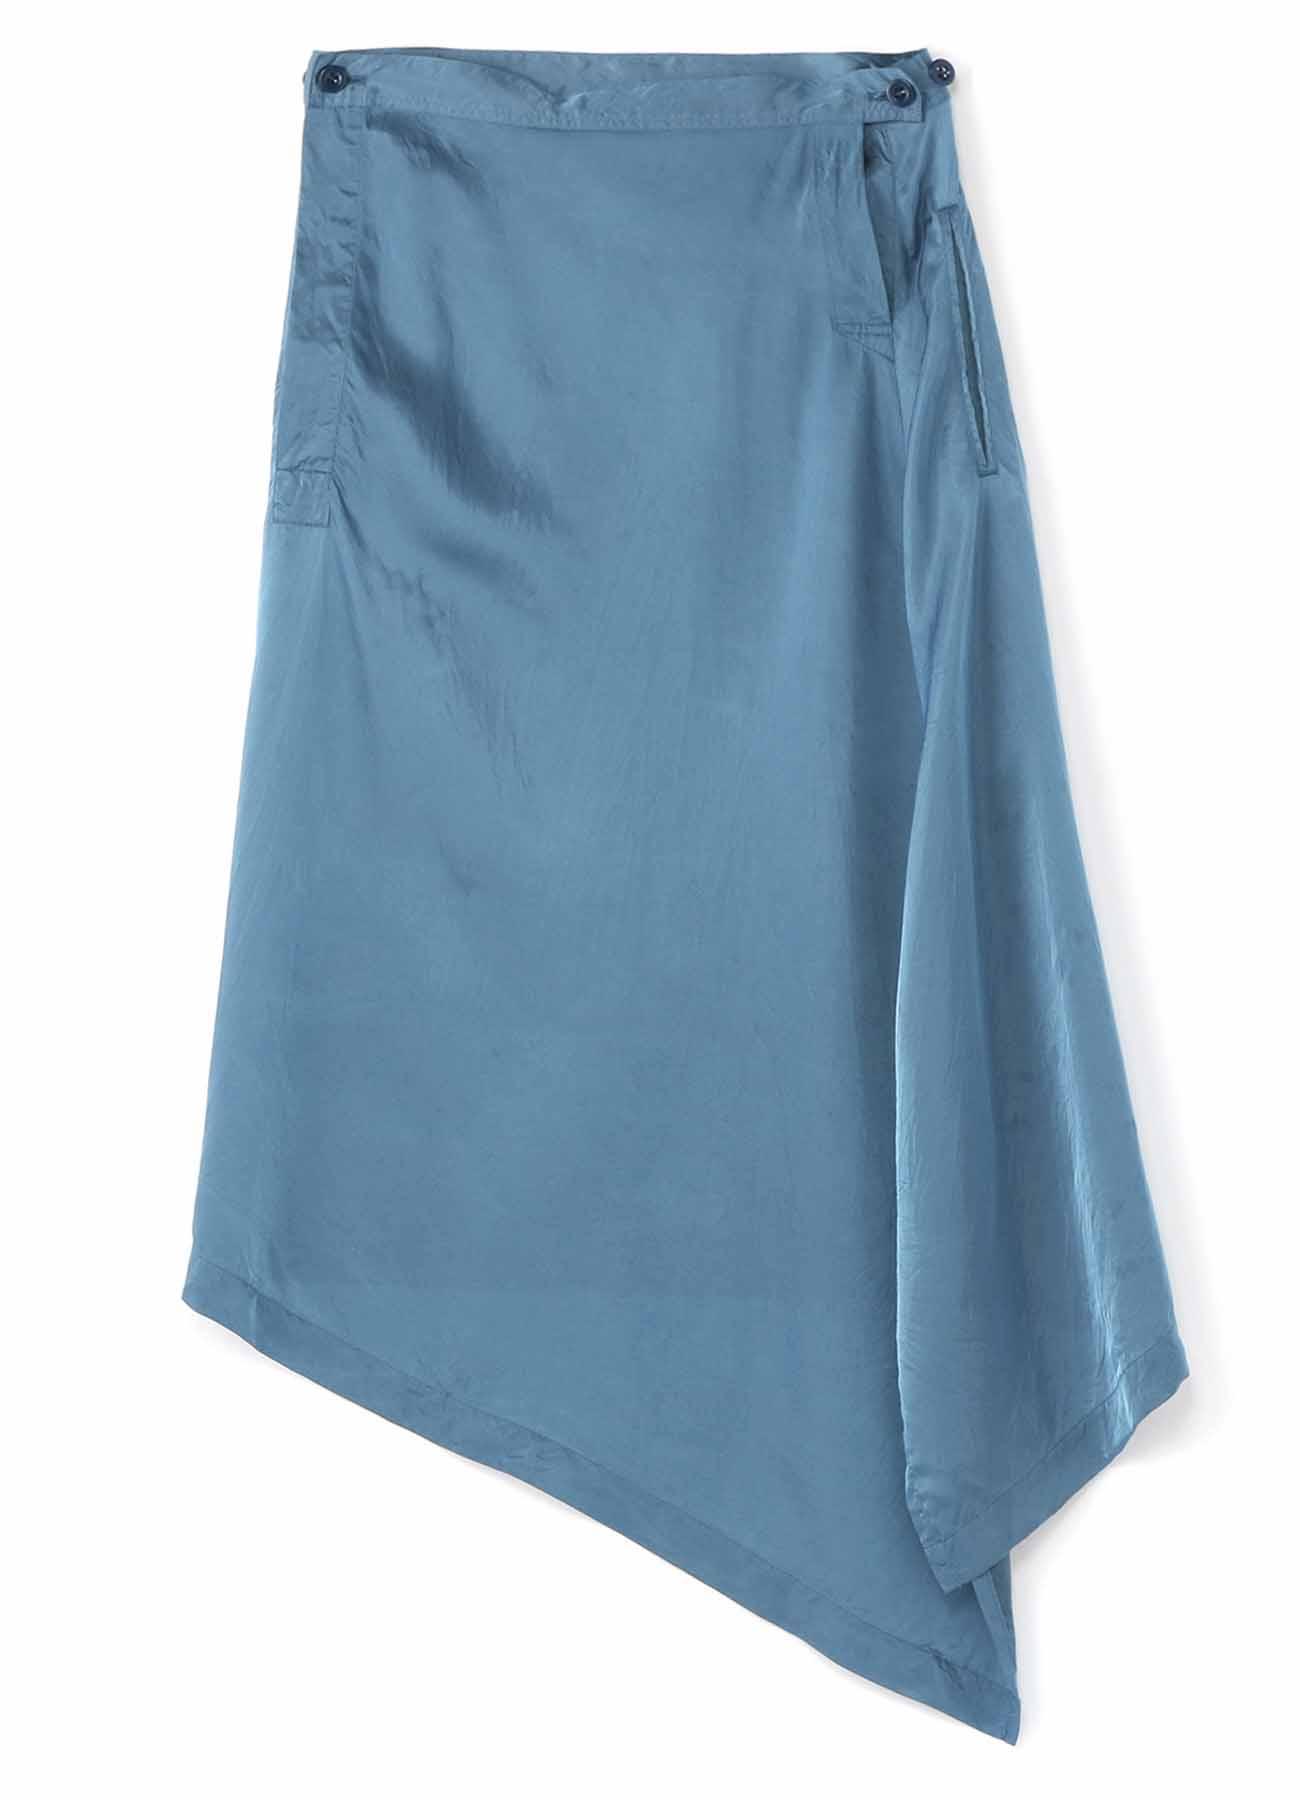 No.13 Flair Skirt Yarn-Dyed Cupra